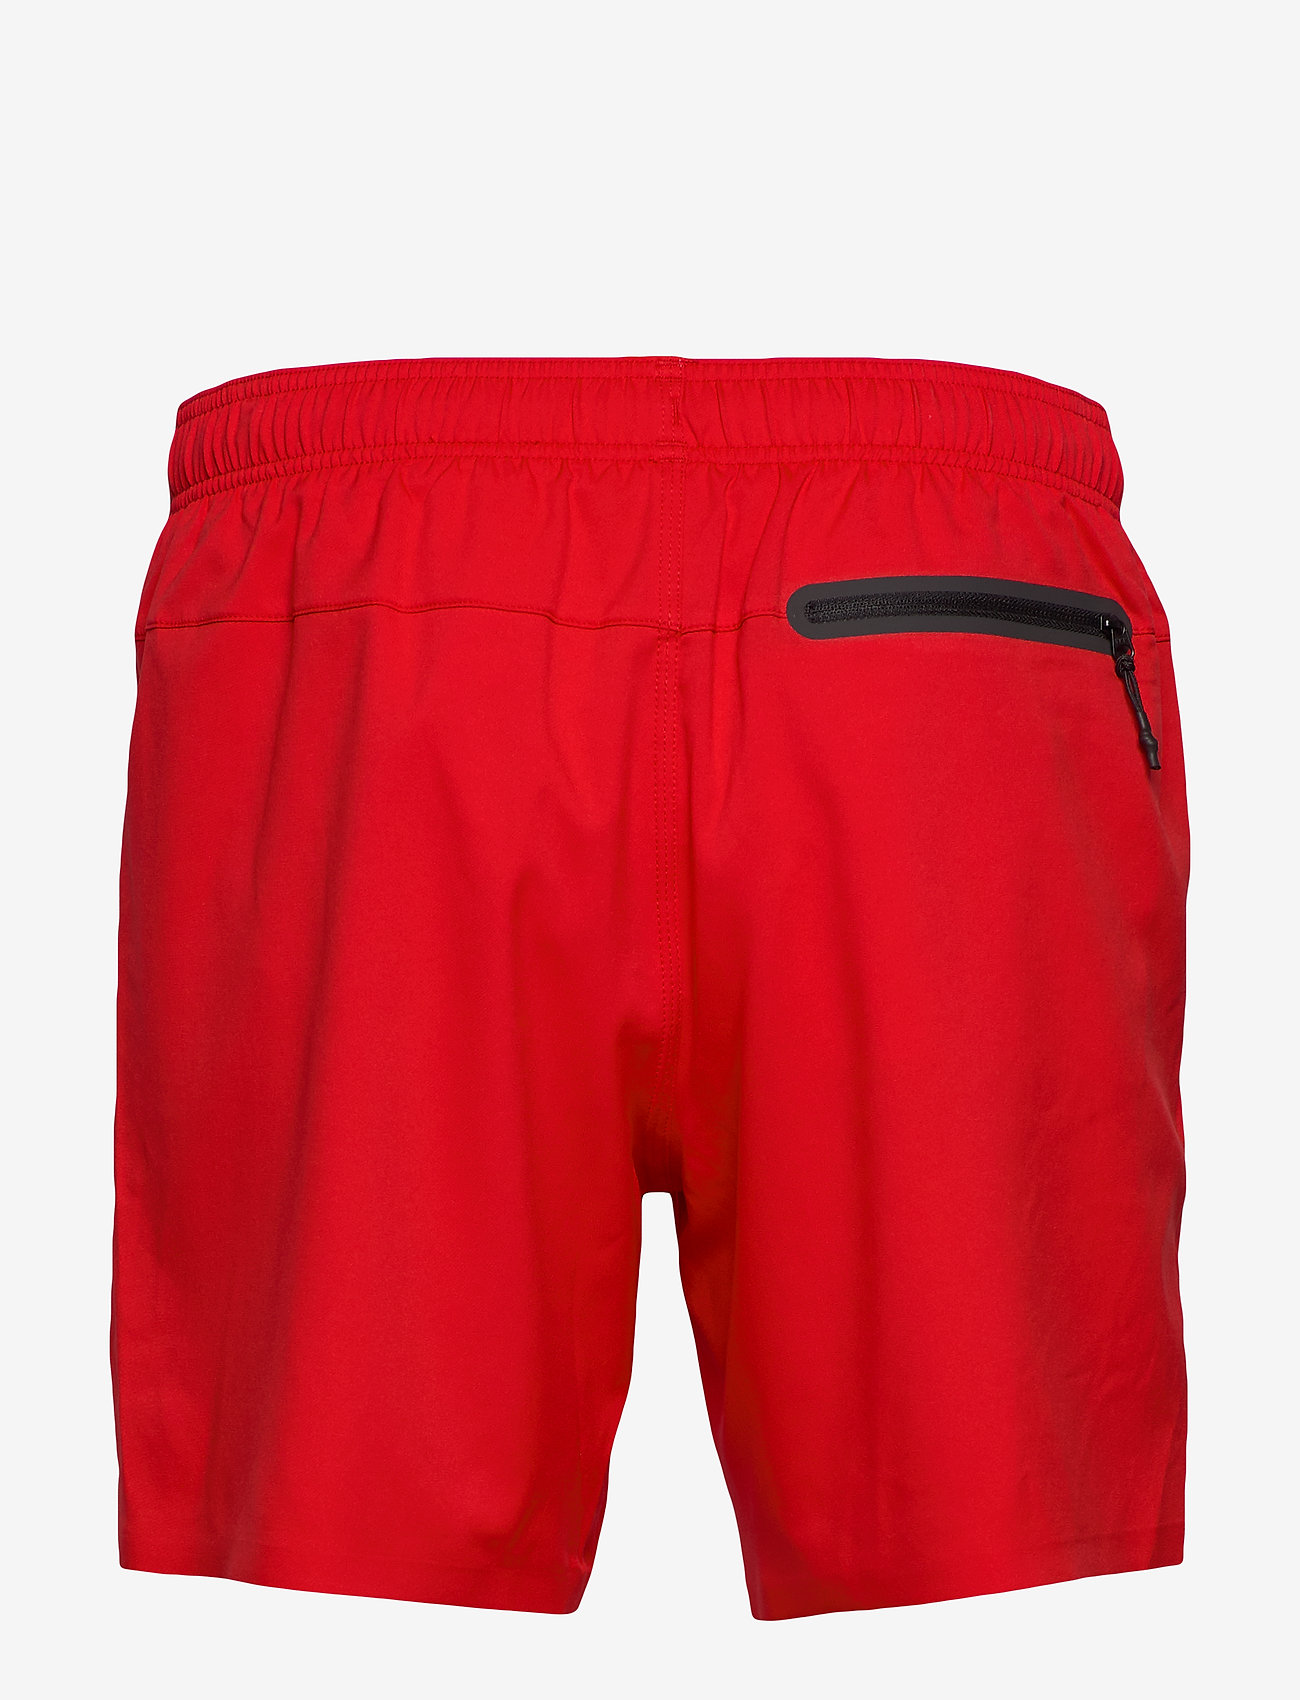 Puma Swim - PUMA SWIM MEN MEDIUM LENGTH SWIM SH - shorts - red - 1